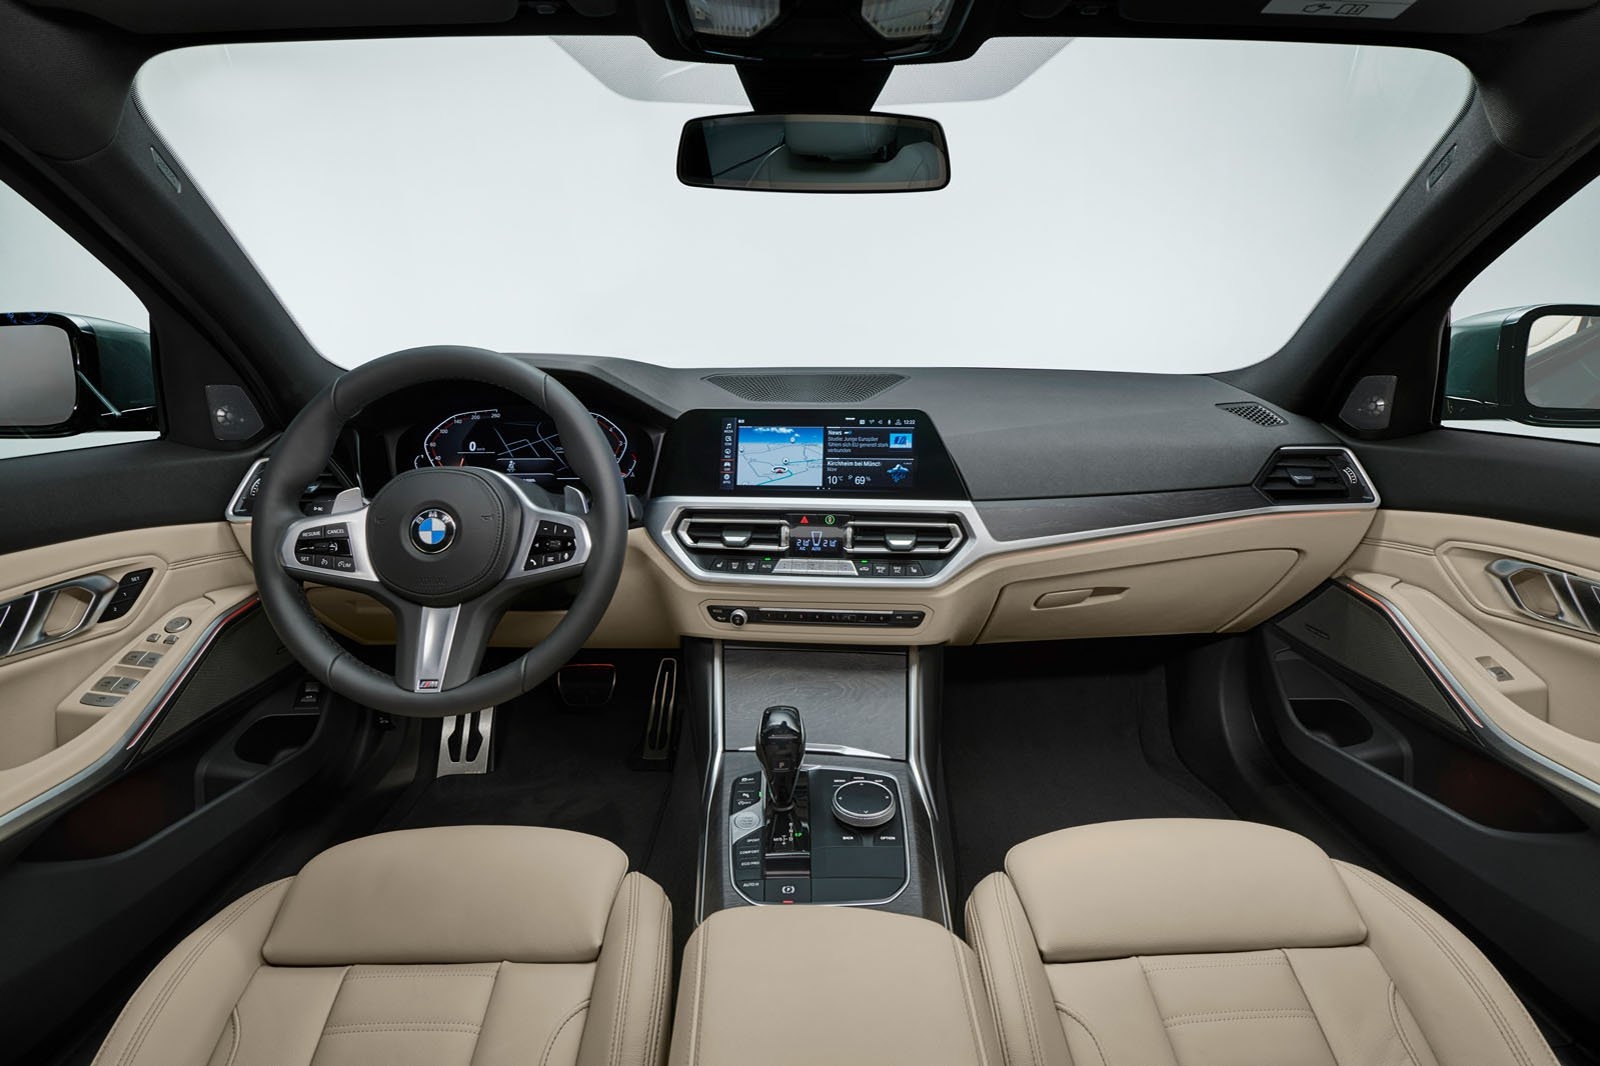 2019 BMW 3 Series Touring interior